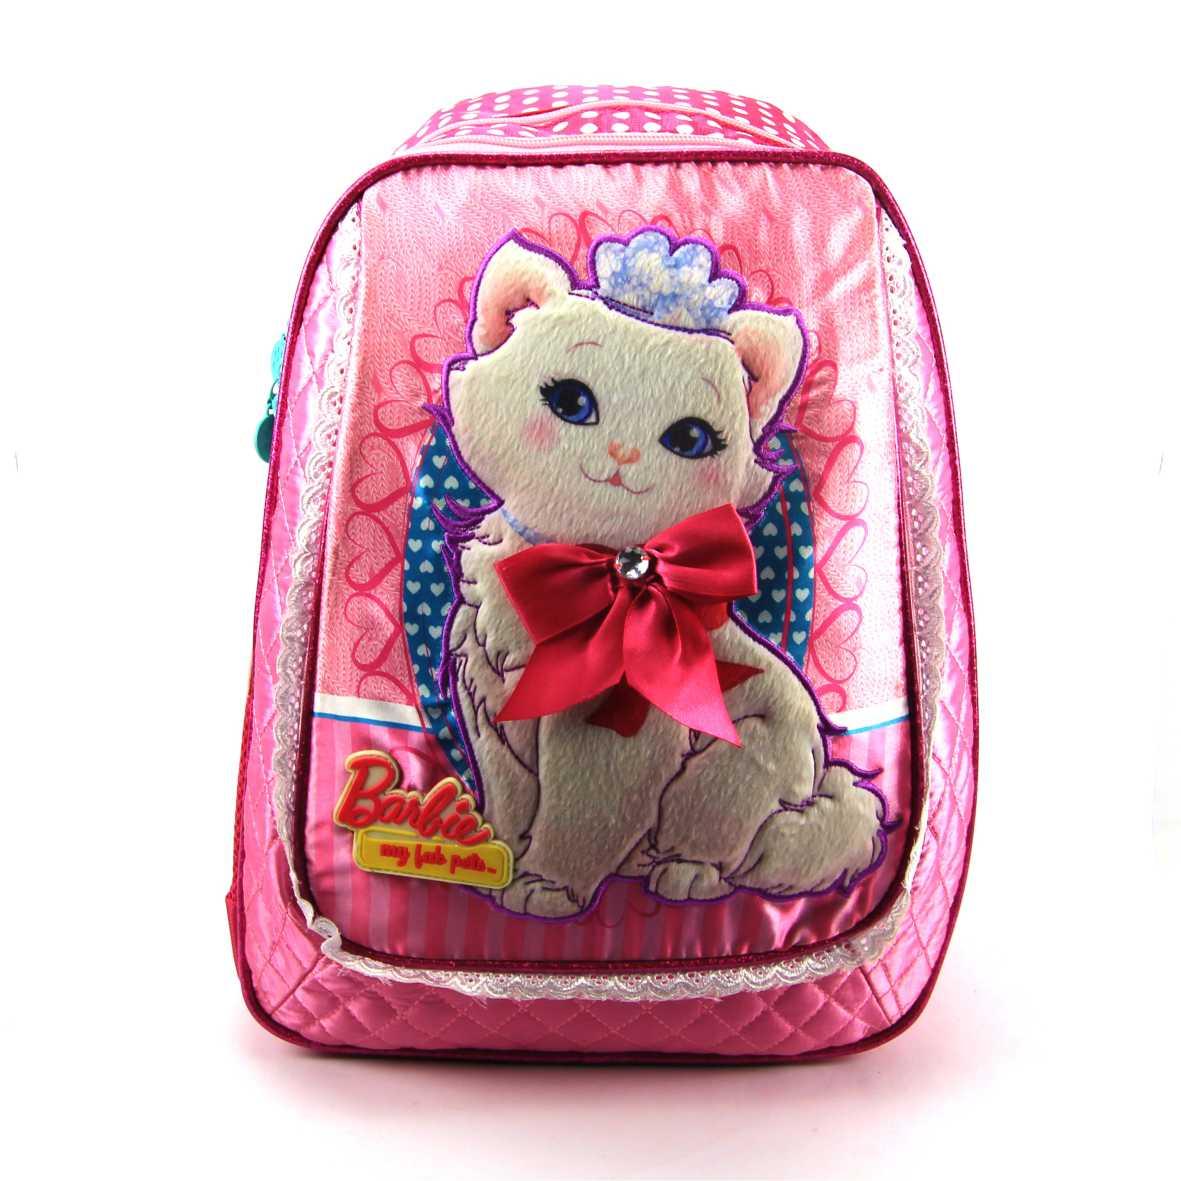 Mochila Infantil Barbie Pets Costas Sestini 063214